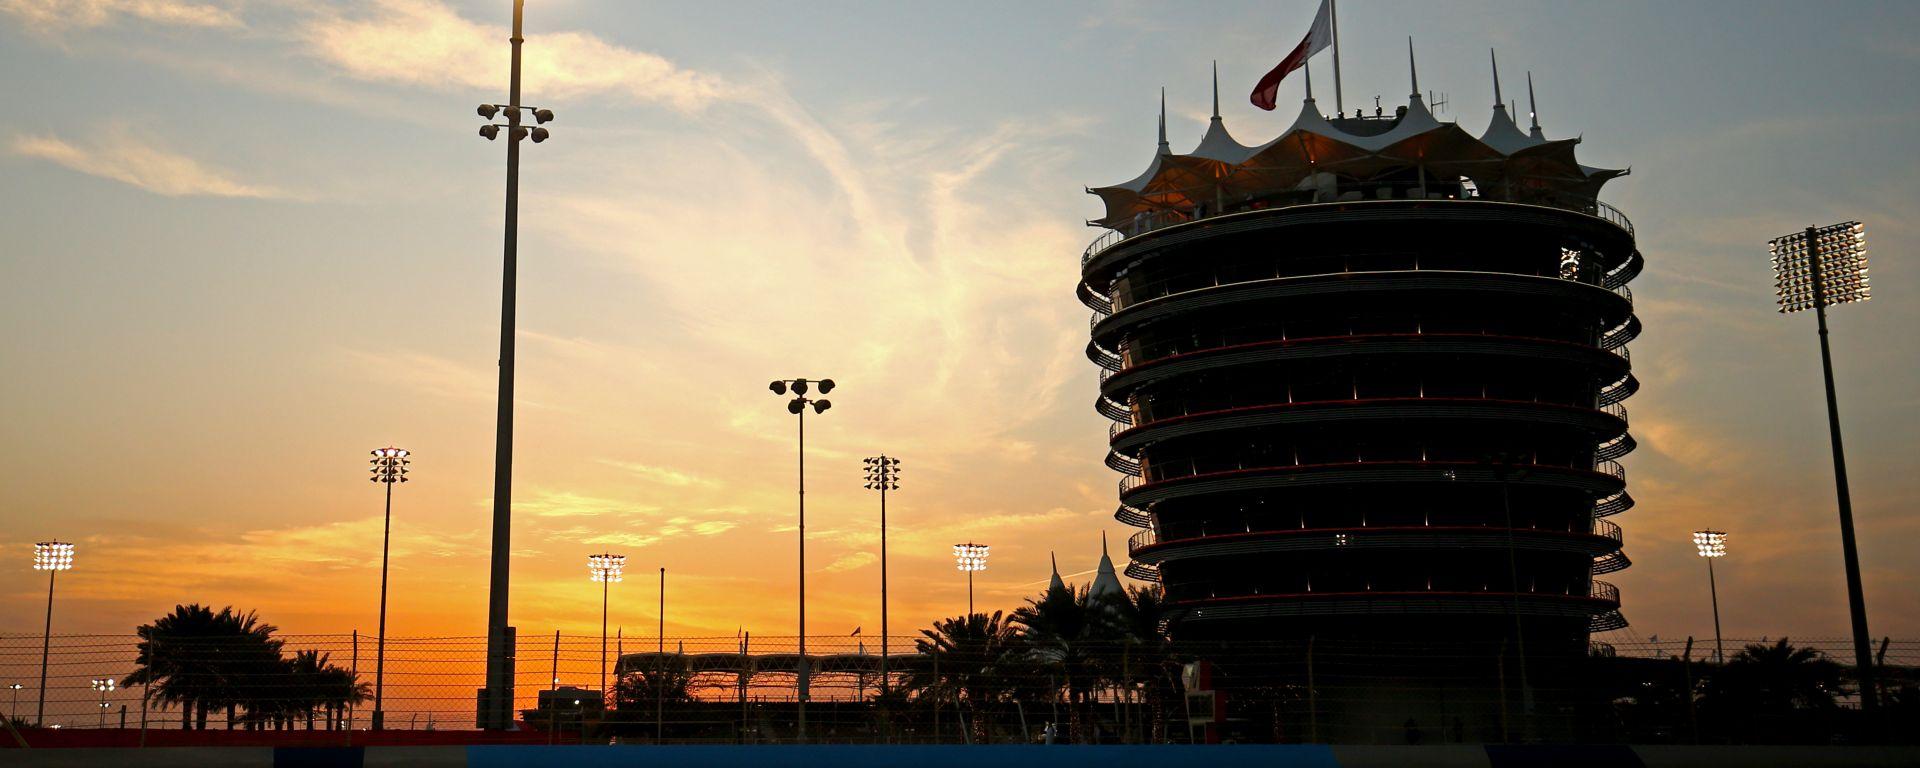 F1: il circuito di Sakhir, sede del GP Bahrain